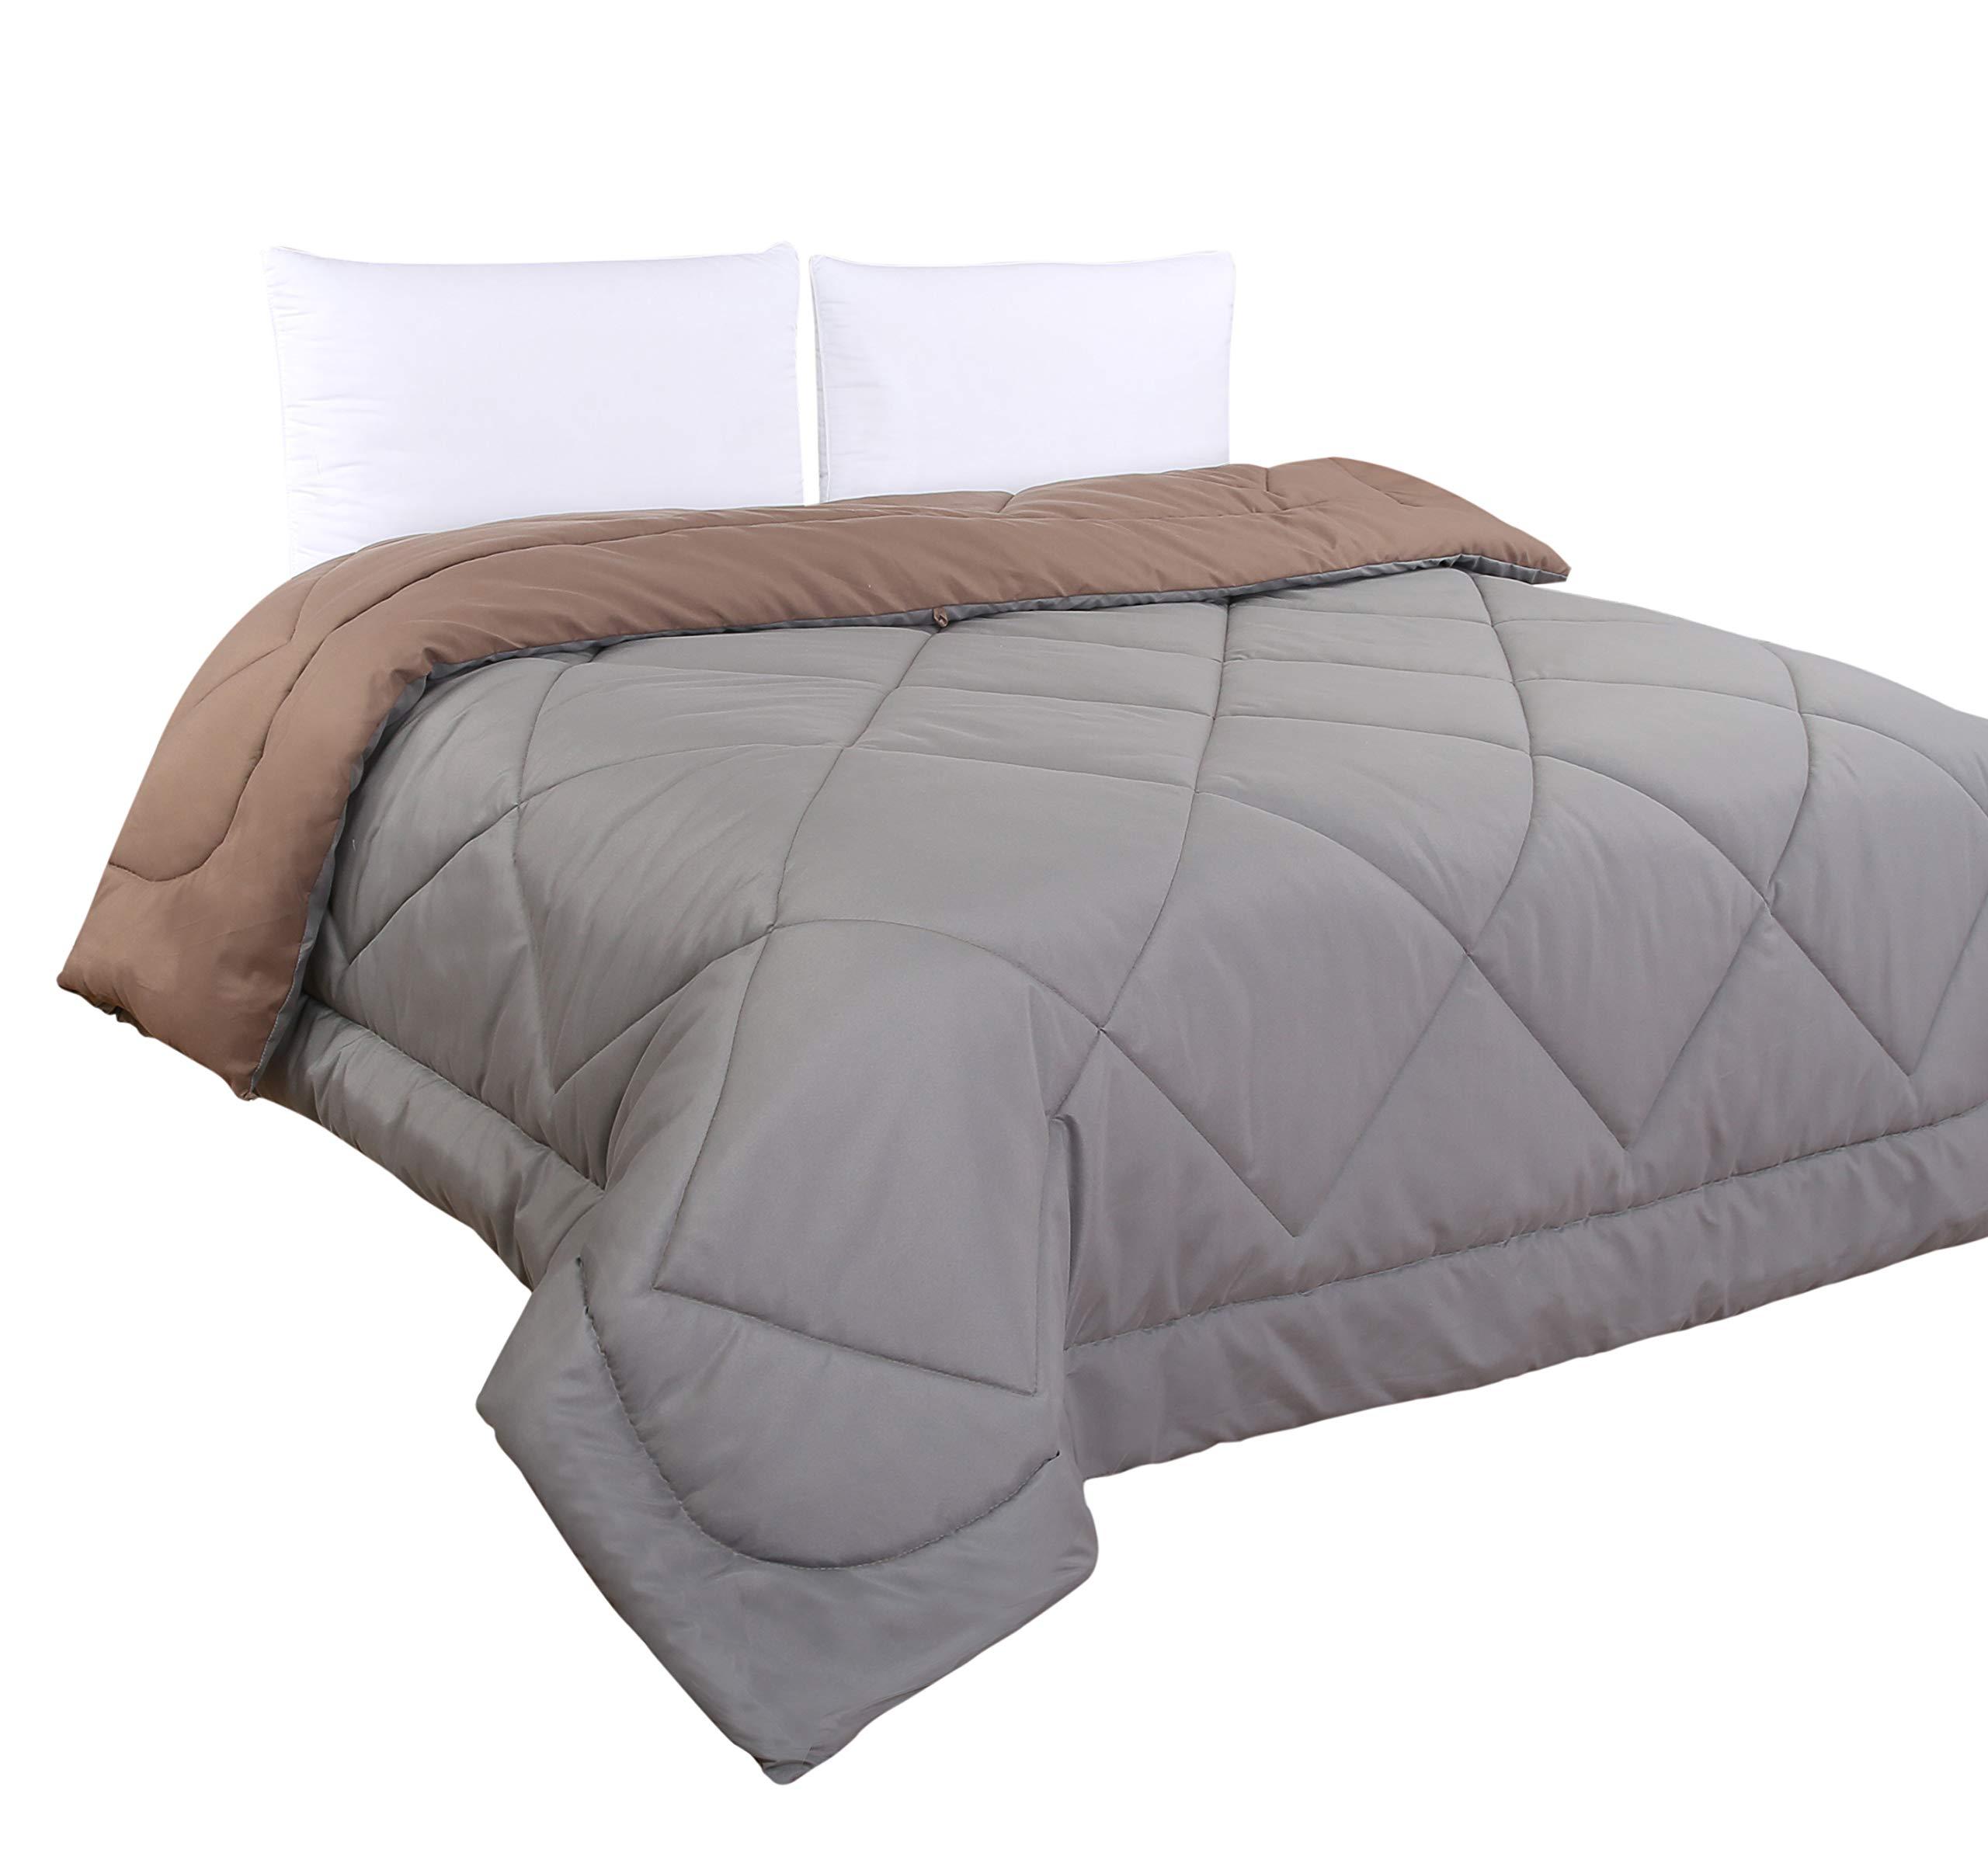 Seashion Home-Slate&Brown Quilt-Comforter/Quilt-UltraSoft-1Pc Quilt&2Pillowcase-MachineWash-Slate/Brown-King